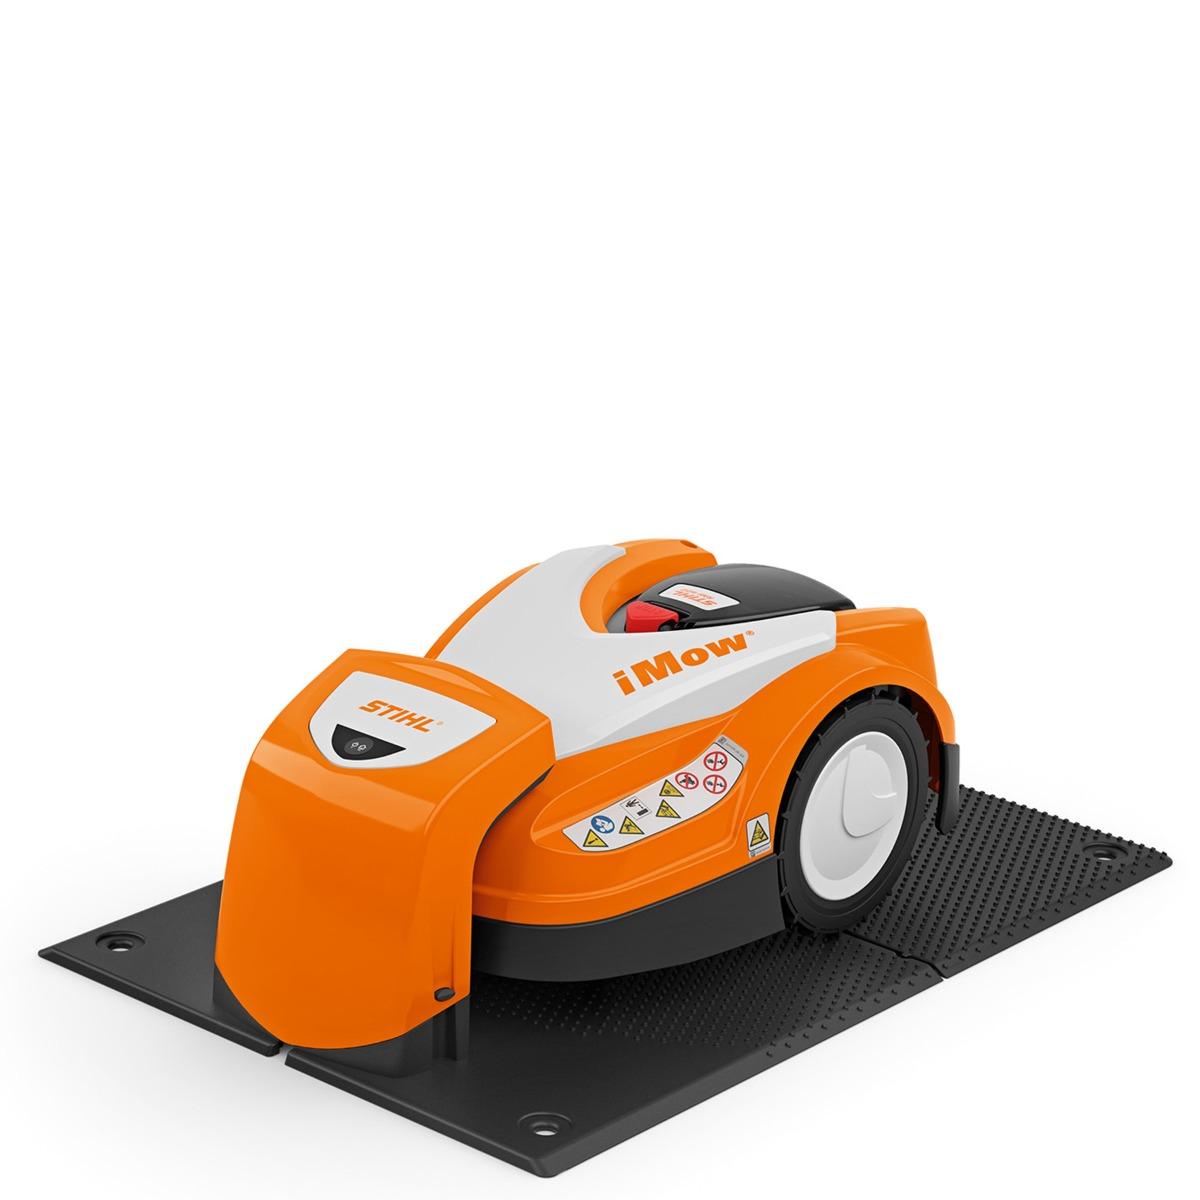 STIHL RMI 422 P ROBOTIC LAWNMOWER